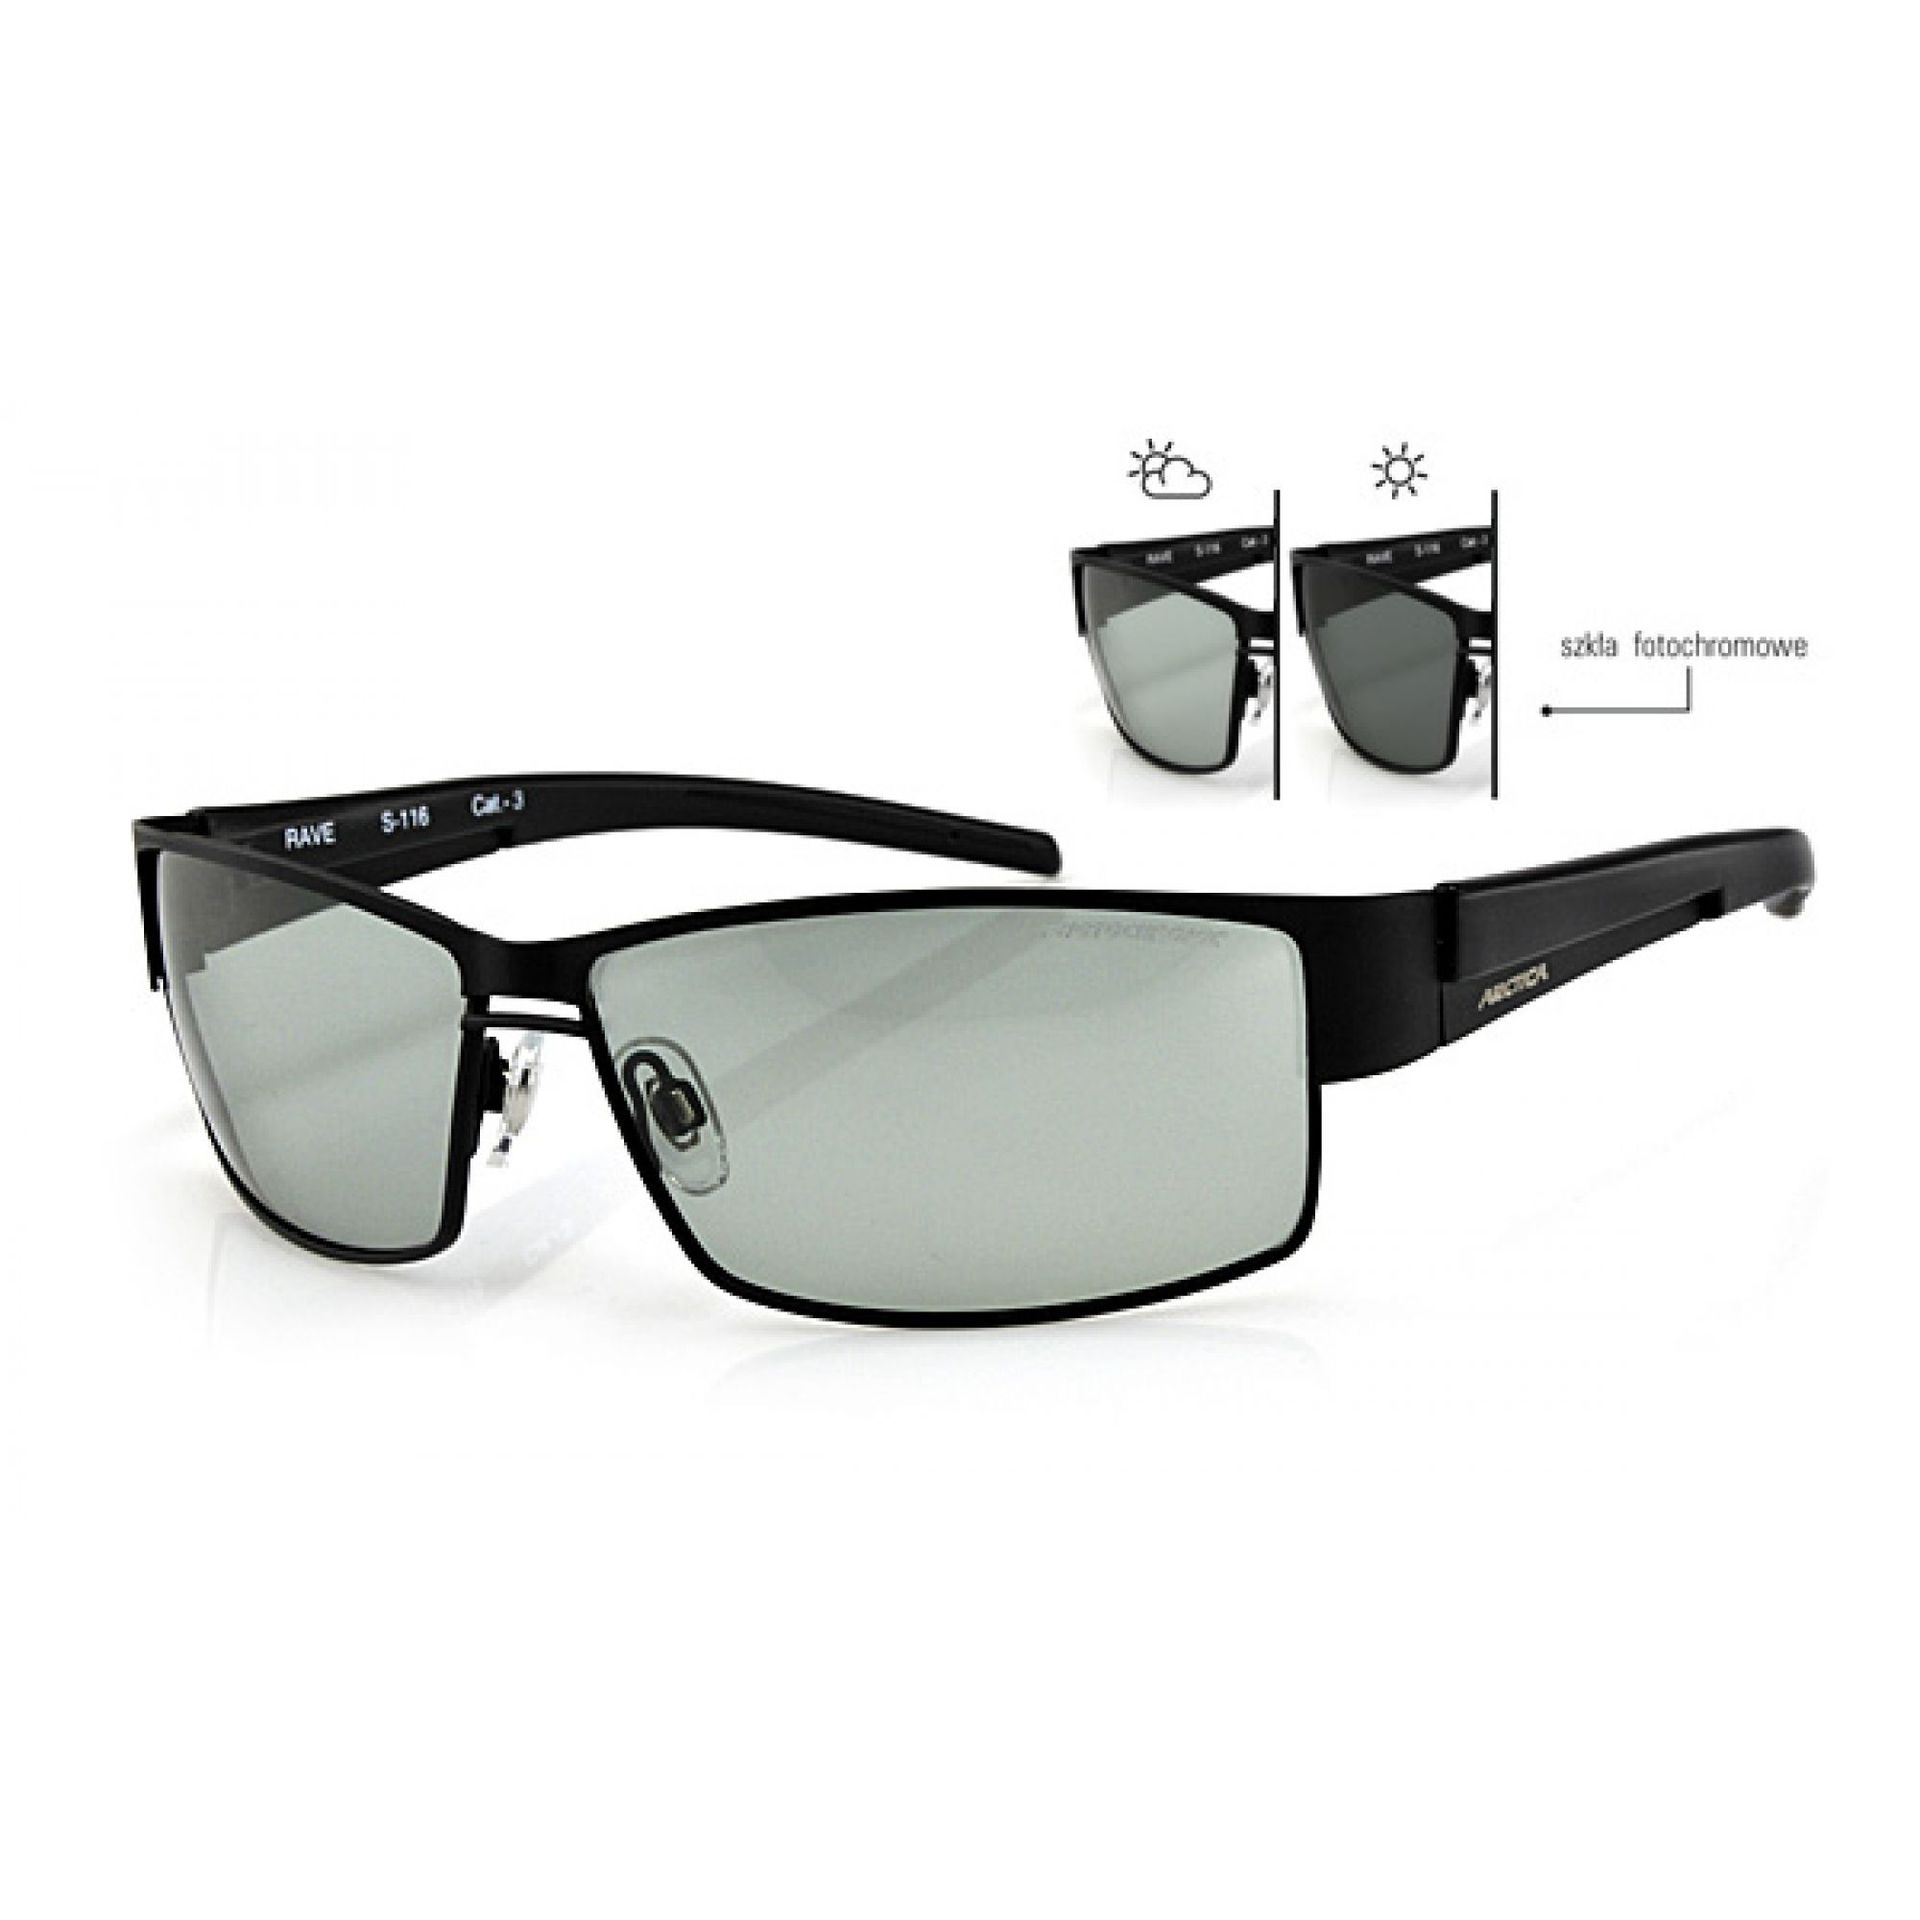 Okulary Arctica S-116 czarne